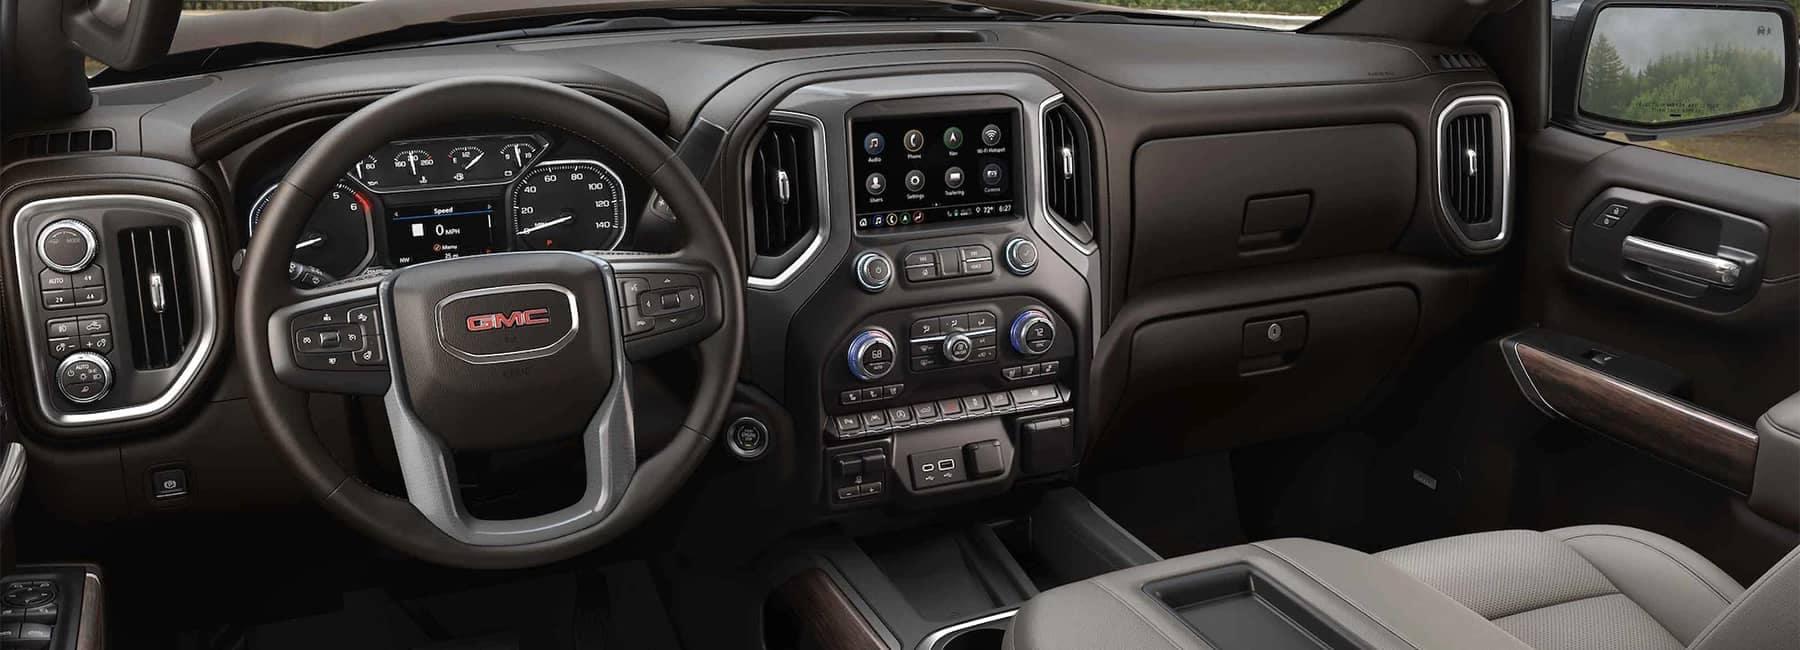 2021 GMC Sierra 1500 Pickup Truck Interior Front Seat Steering wheel